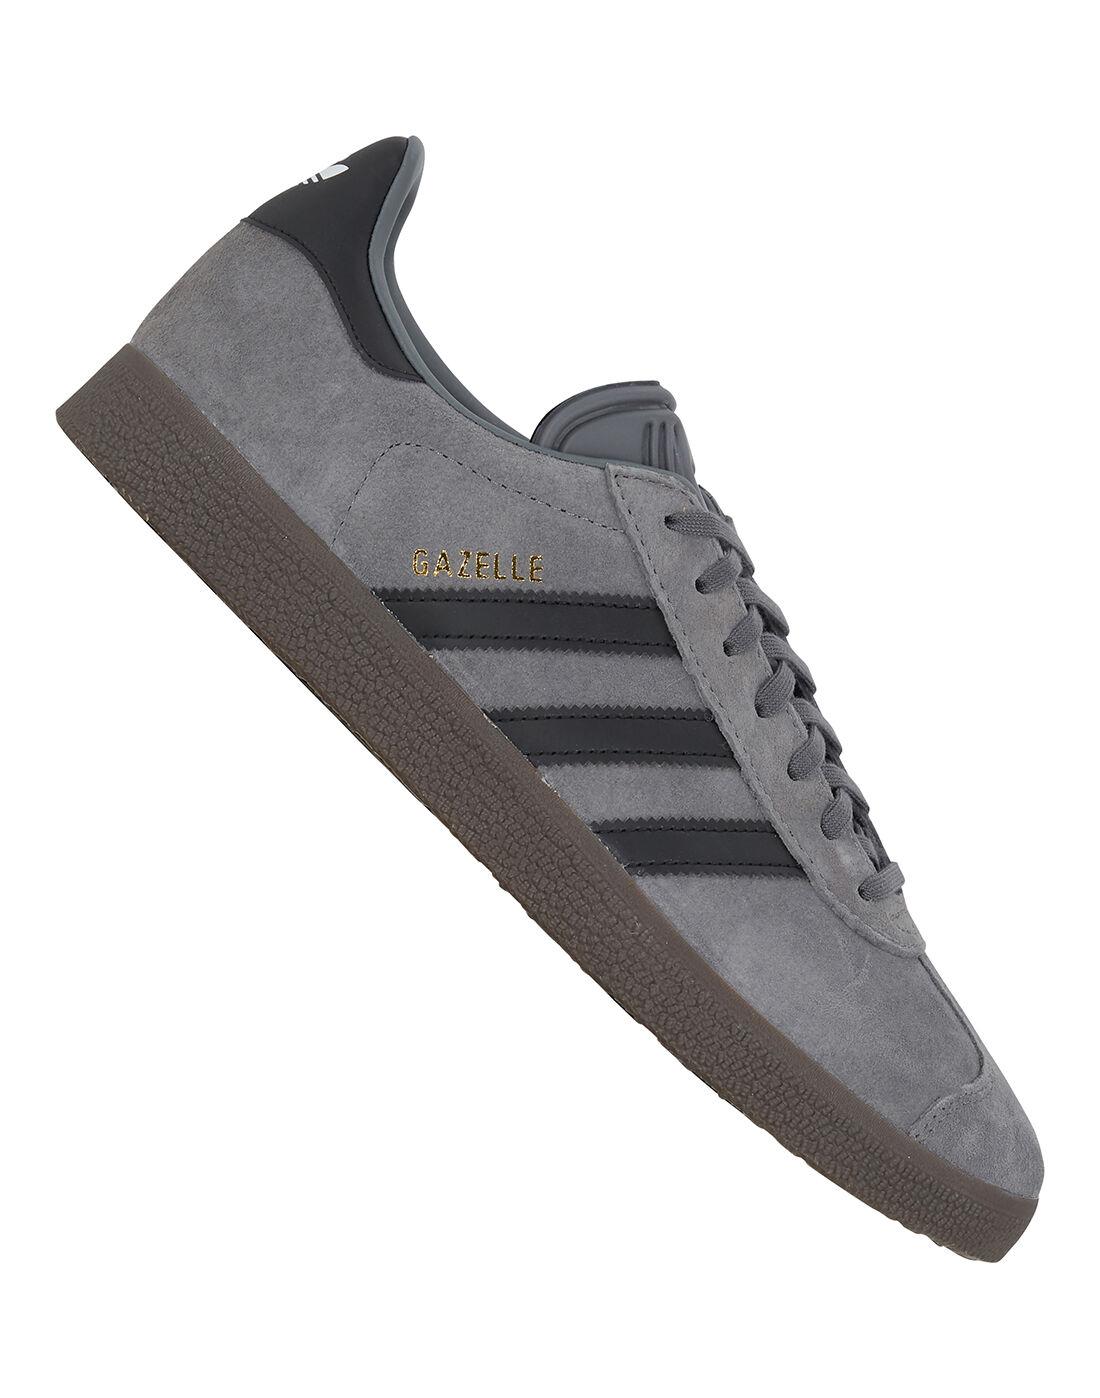 adidas Originals adidas superstar floral black and white shoes | Mens Gazelle